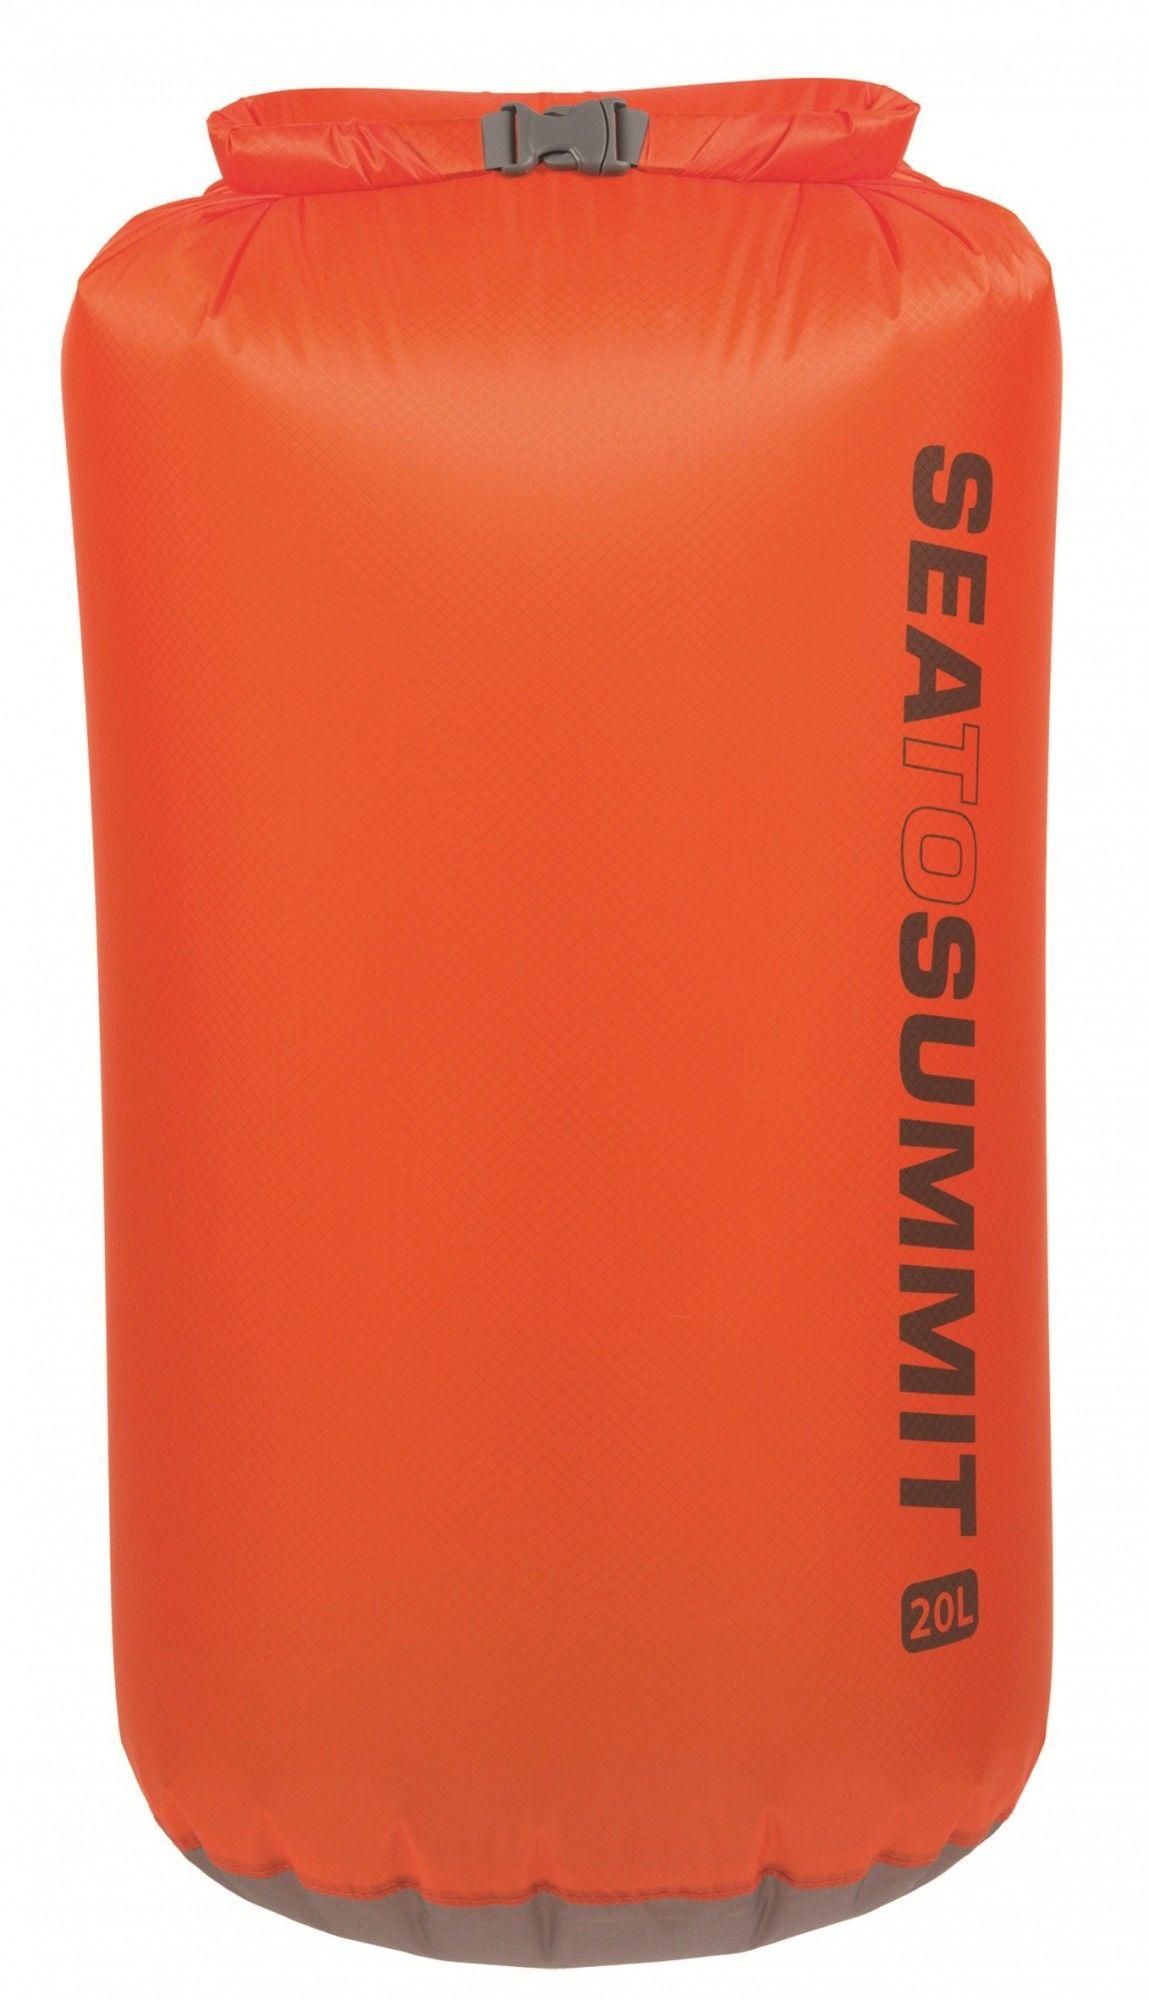 Sea to Summit Ultra-SIL Dry Sack 20L Orange, Taschen, 20l